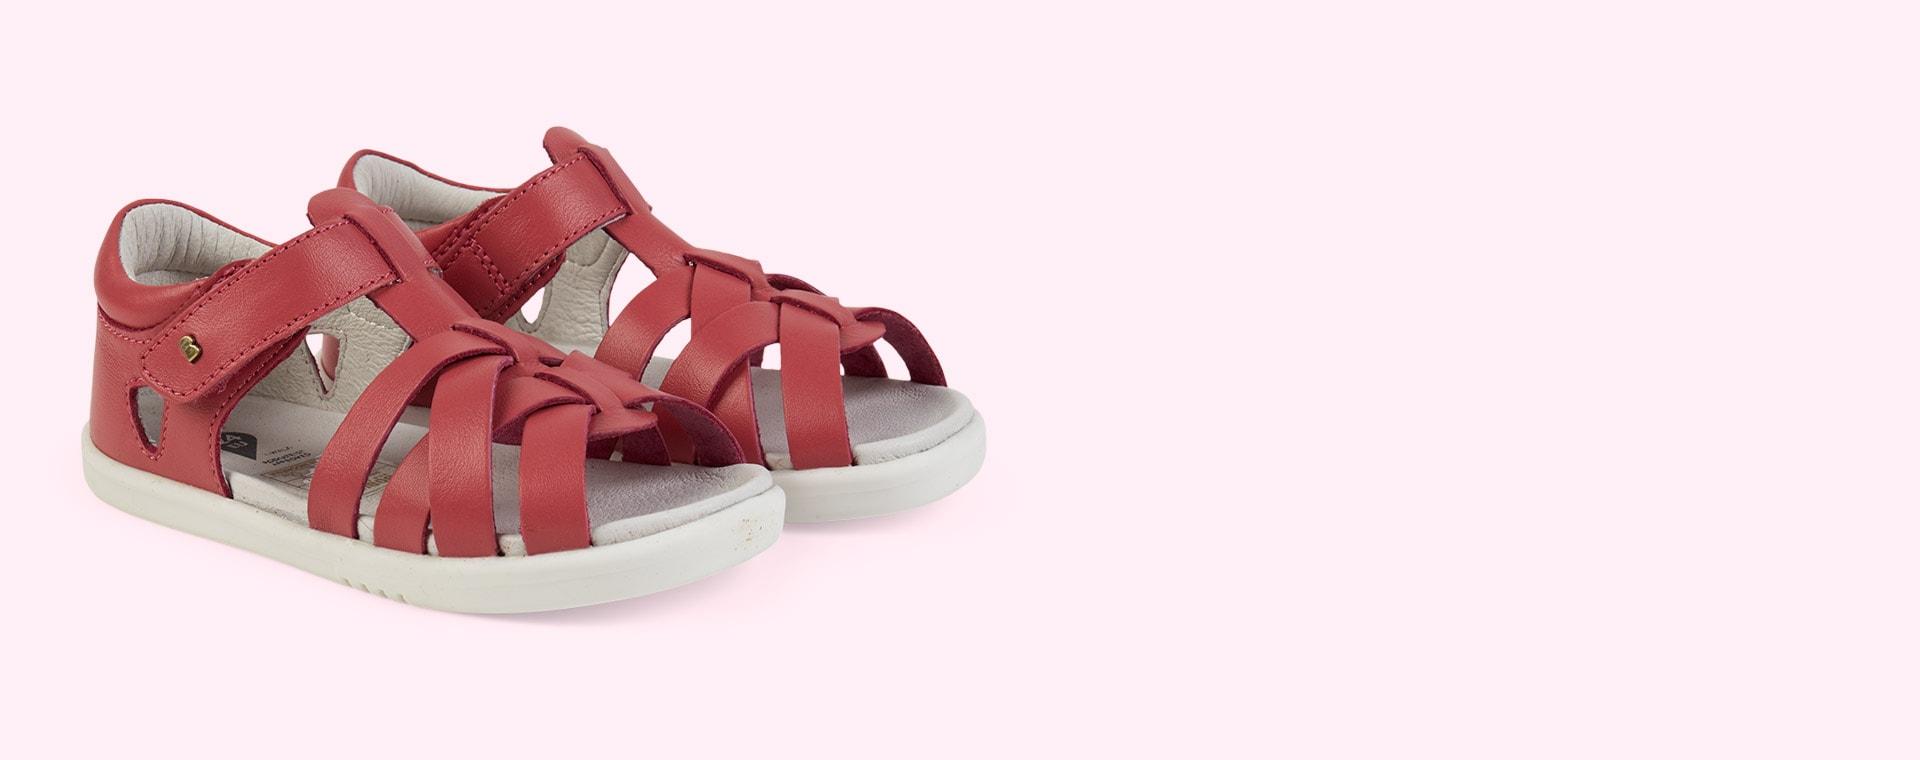 Strawberry Bobux I-Walk Tropicana Sandal